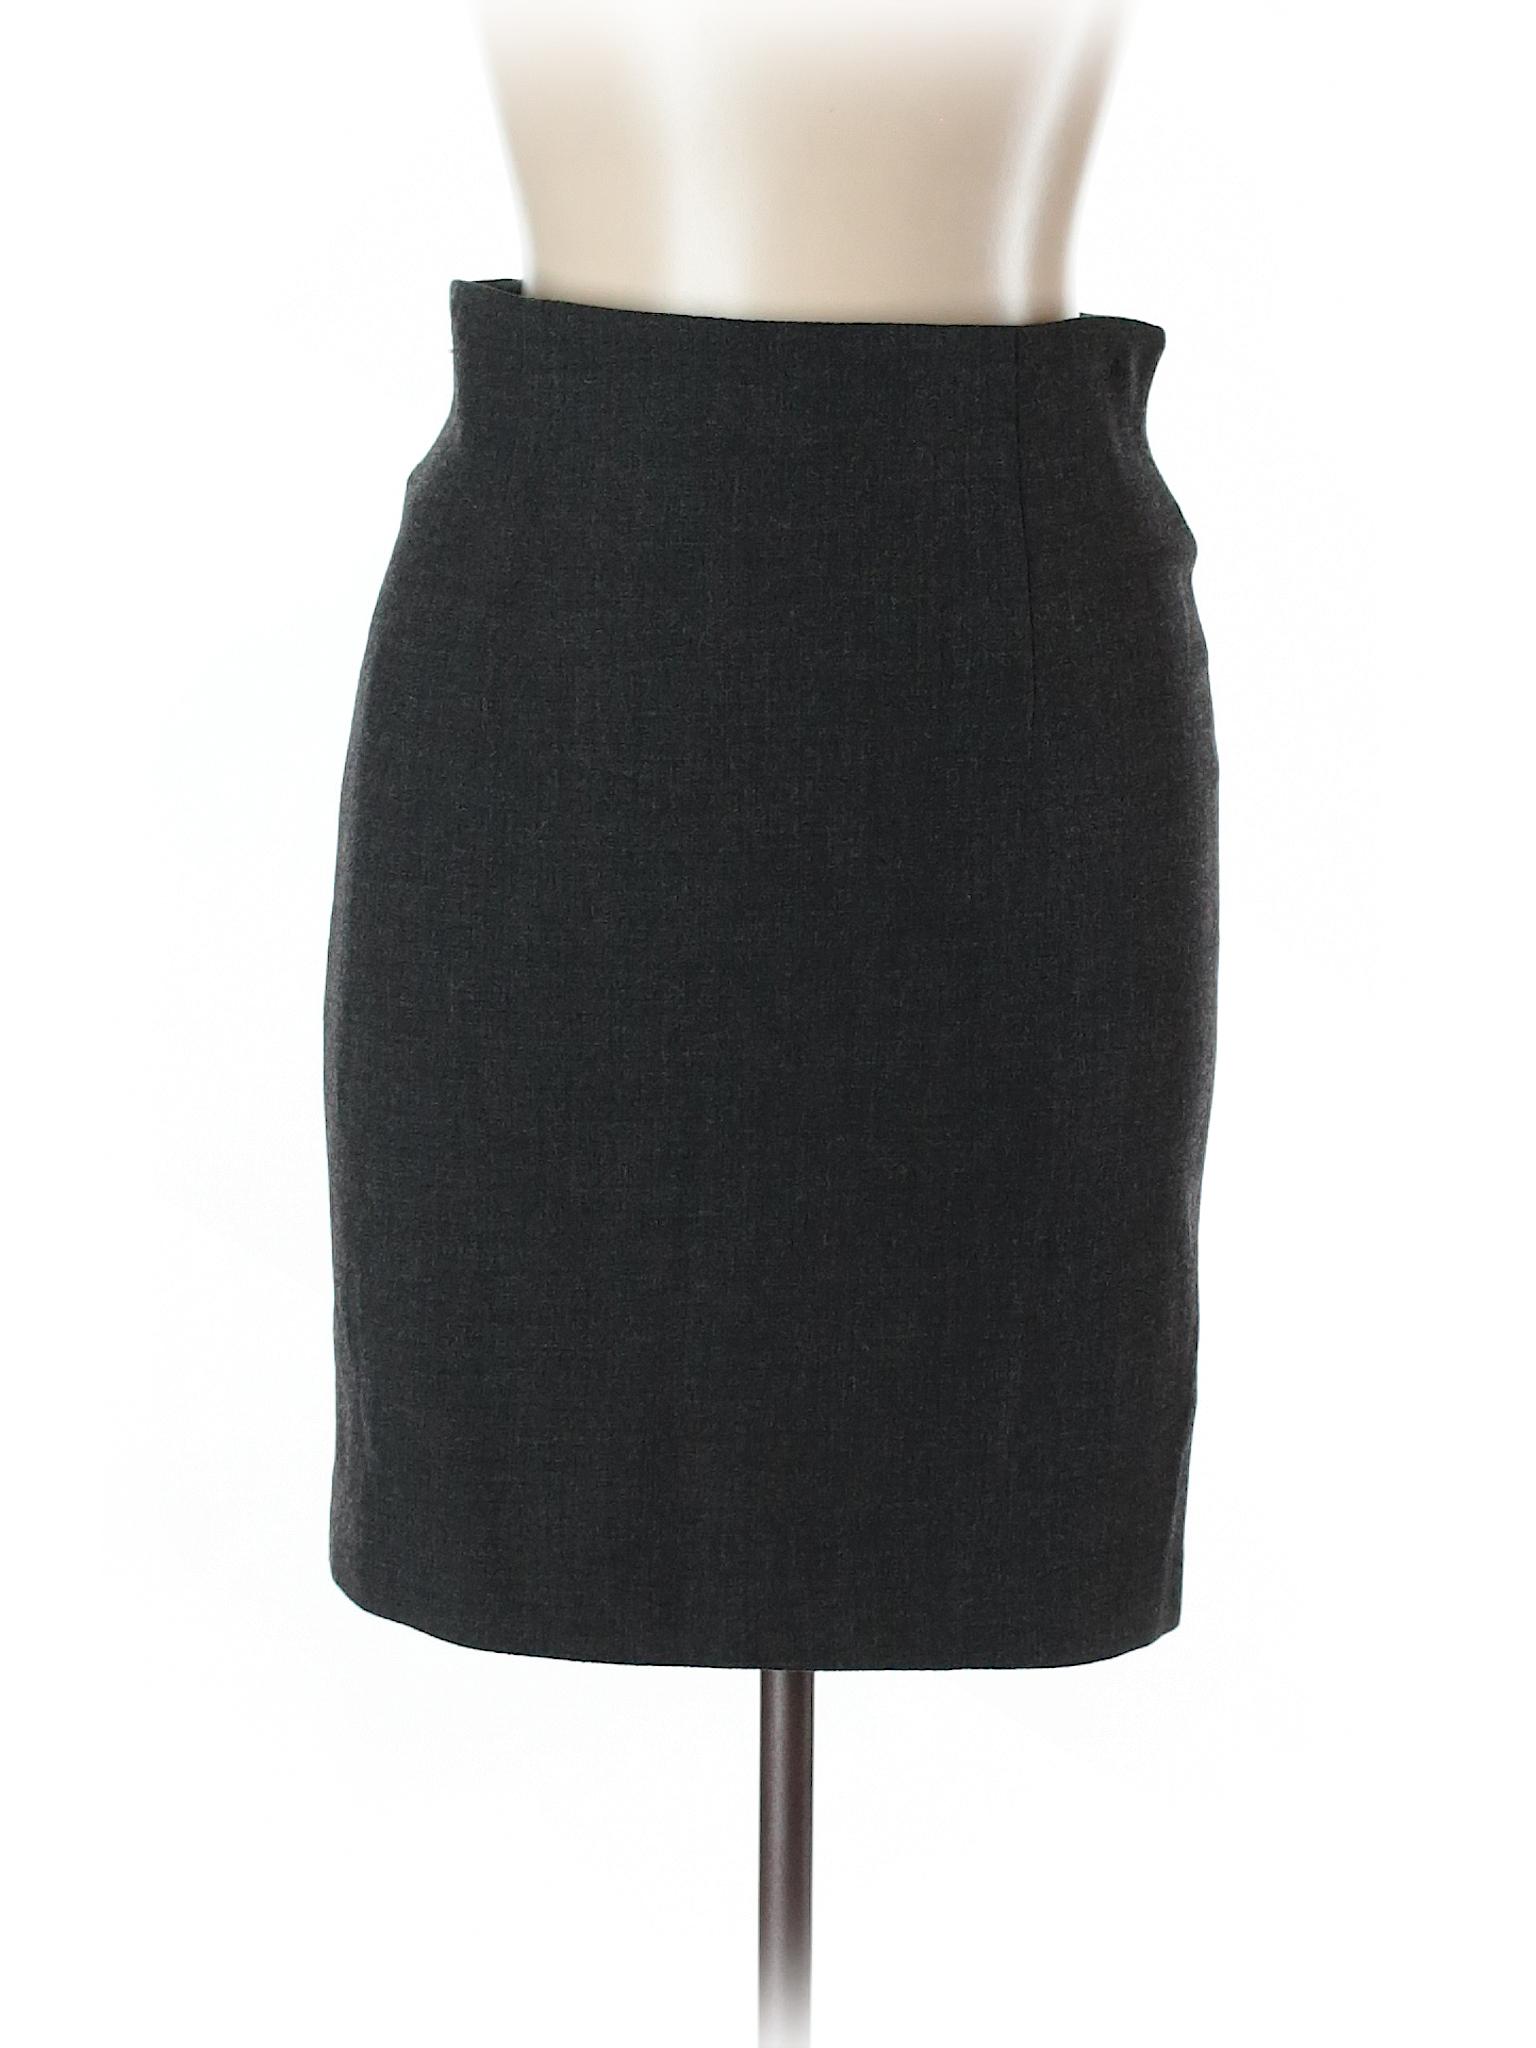 Wool Wool Skirt Skirt Boutique Boutique 5WYq1vwXn